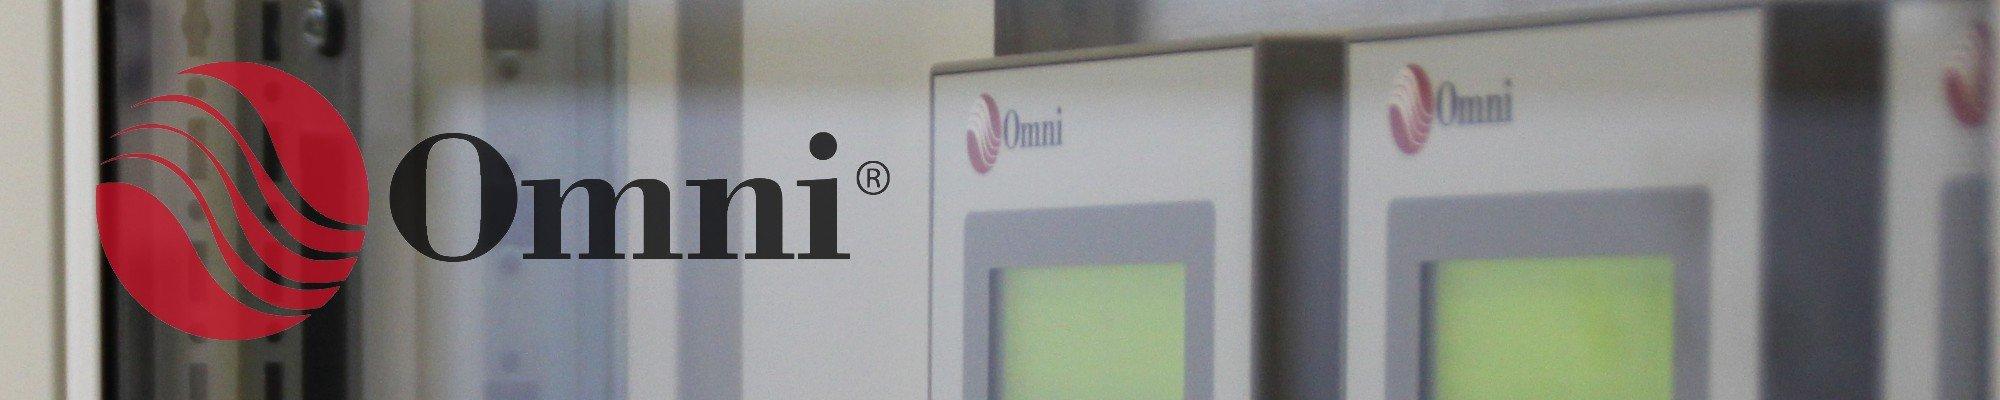 OMNI Flowcomputer - ODS web page Header